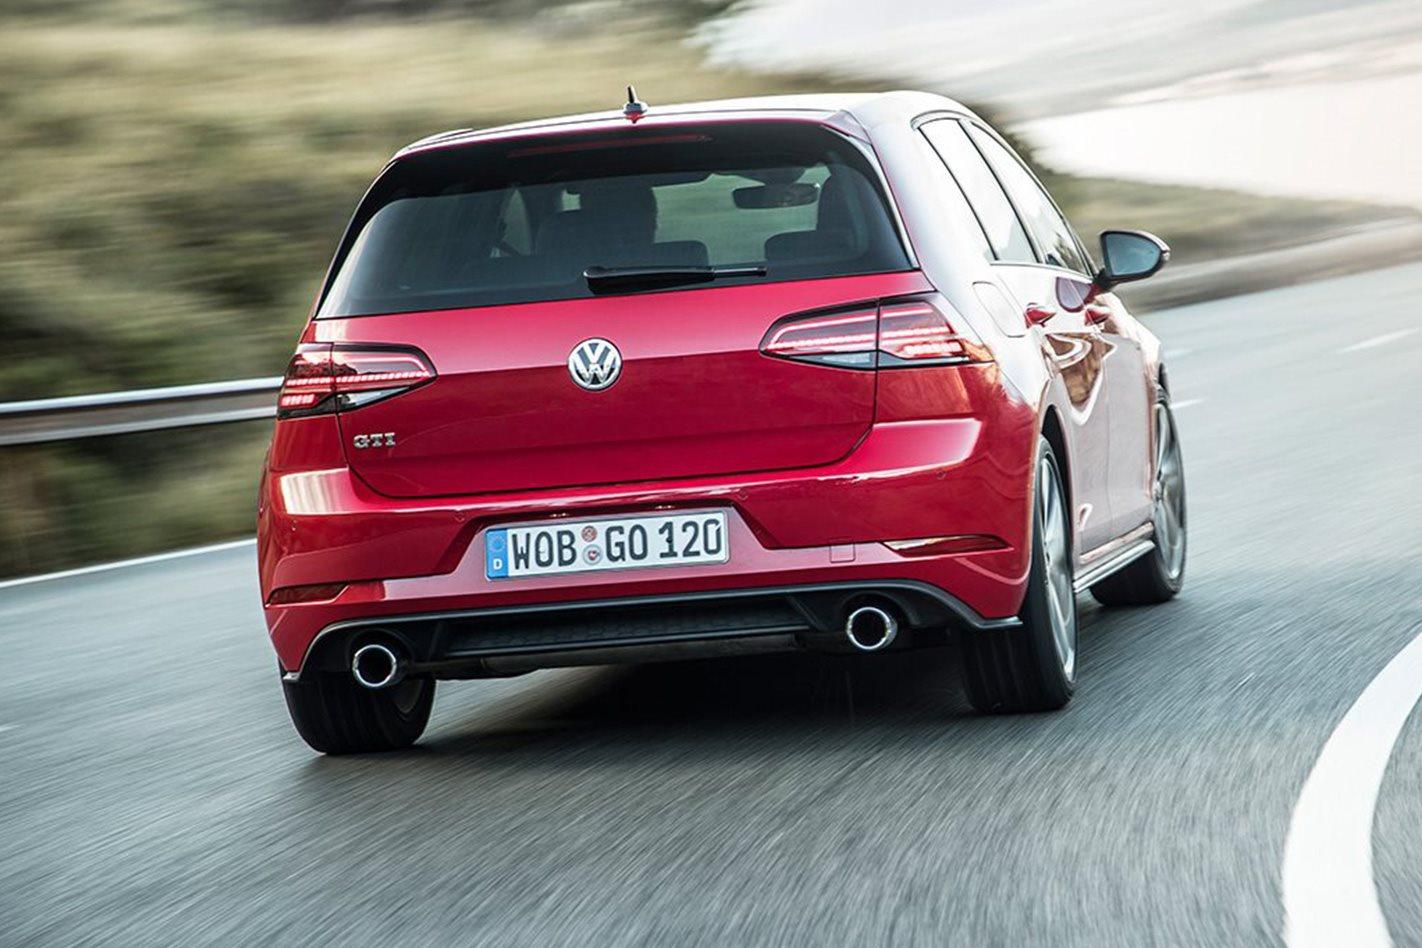 2017 Volkswagen Golf GTI 7.5 rear